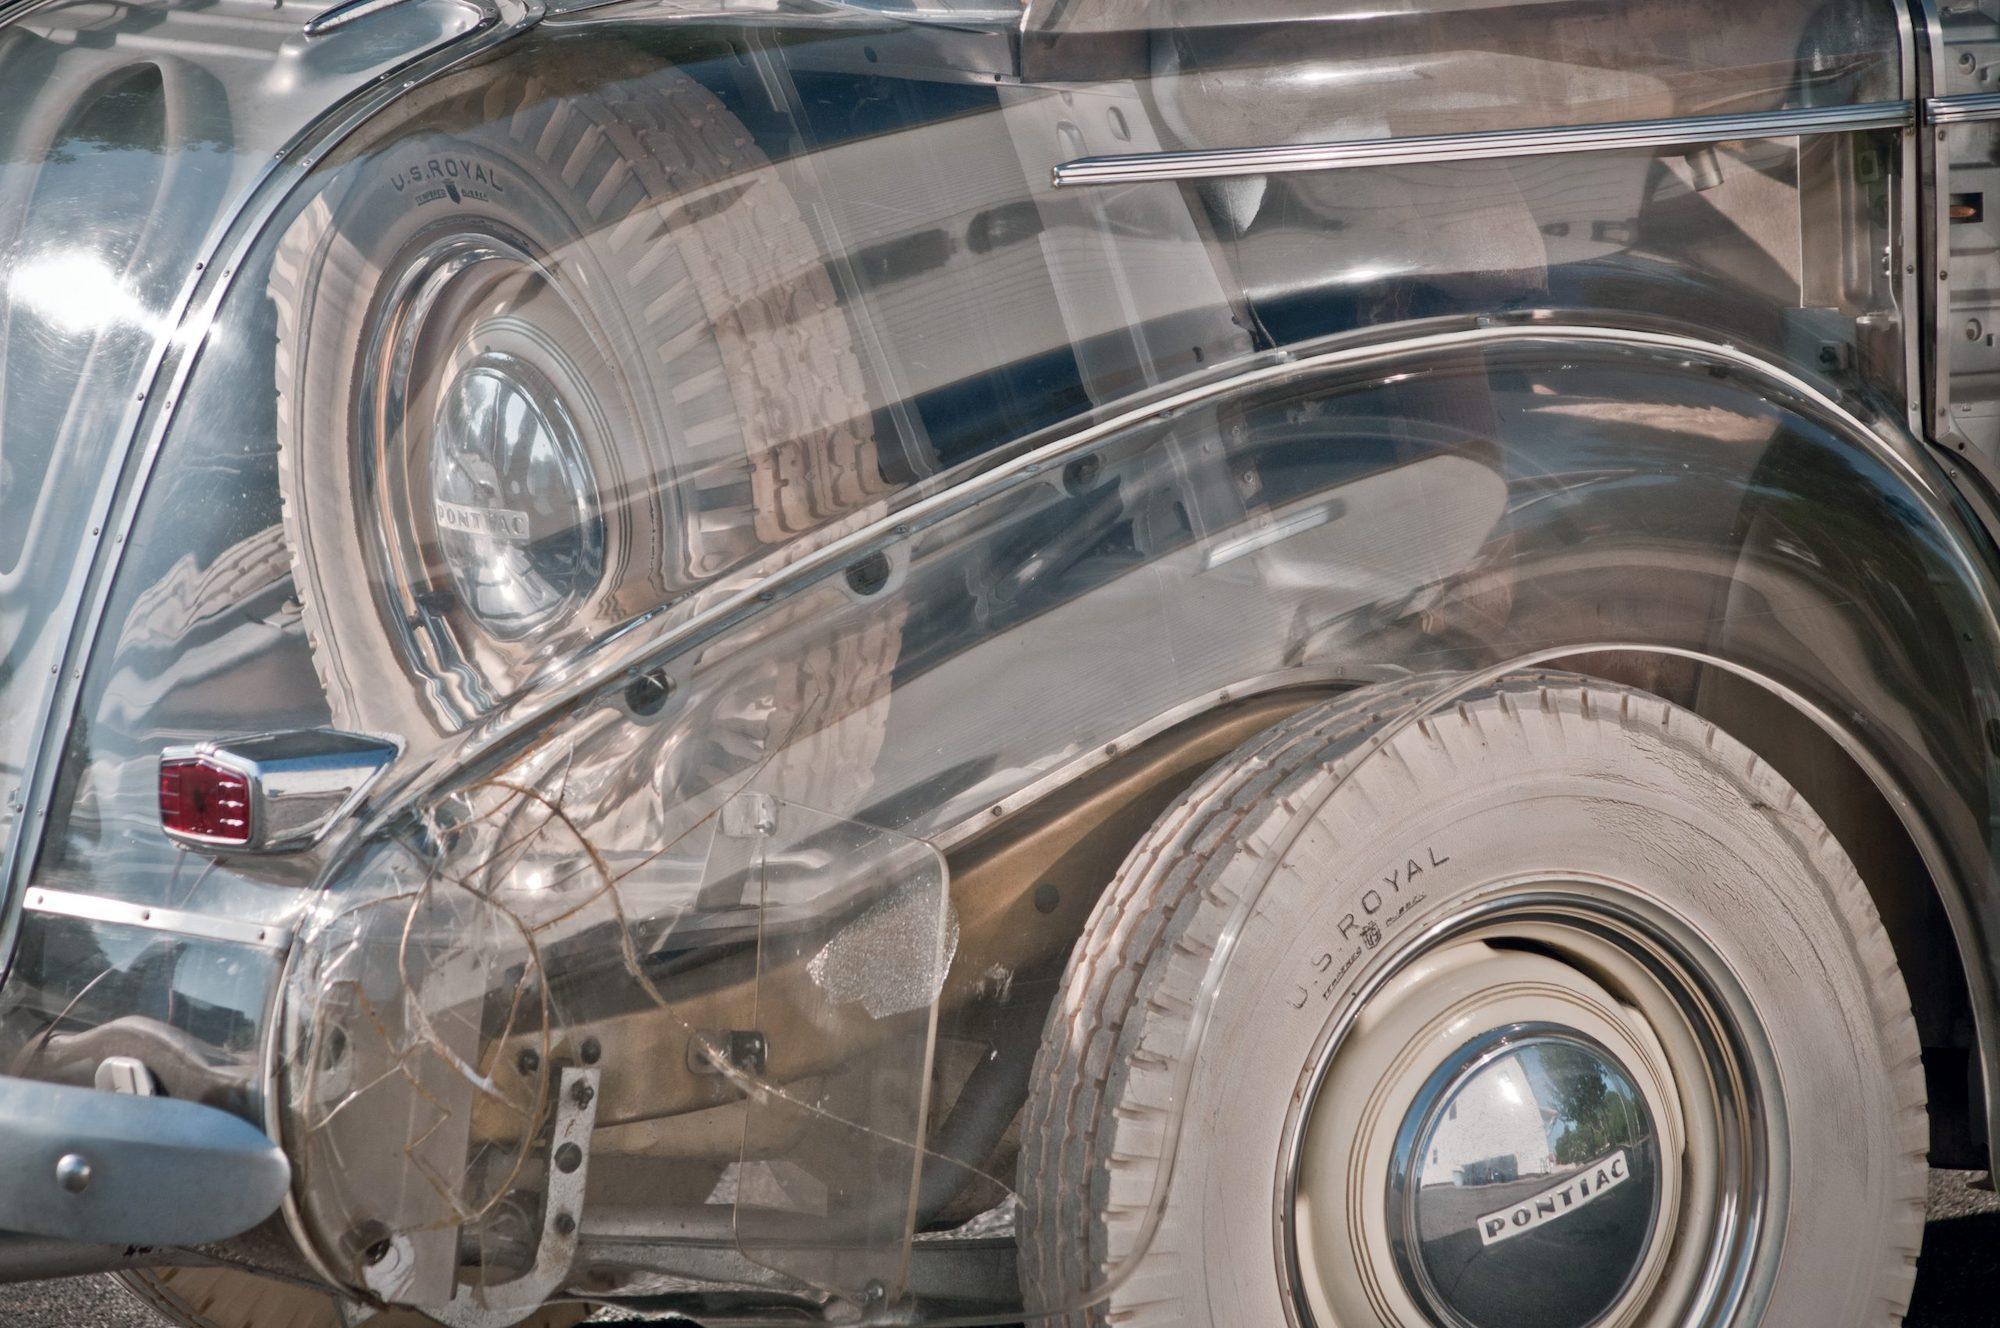 1939-Pontiac-Plexiglas-Deluxe-Six-Ghost-Car-_12-scaled